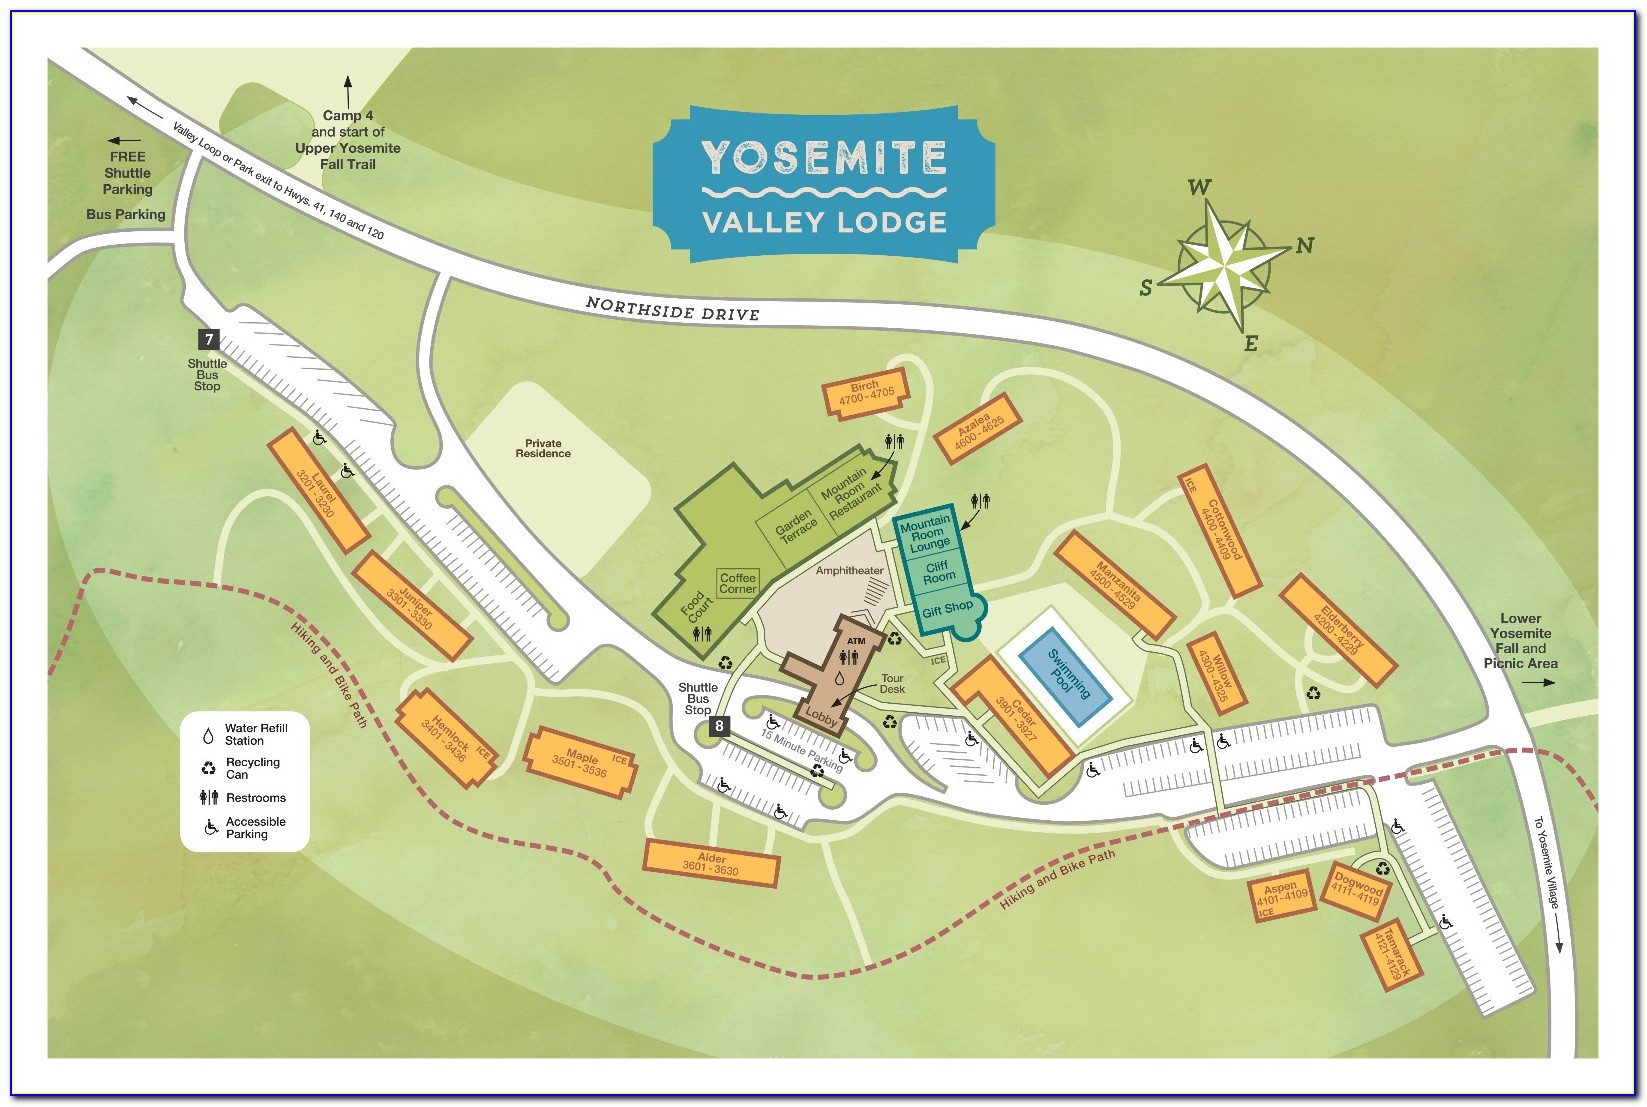 Yosemite Valley Lodge Final